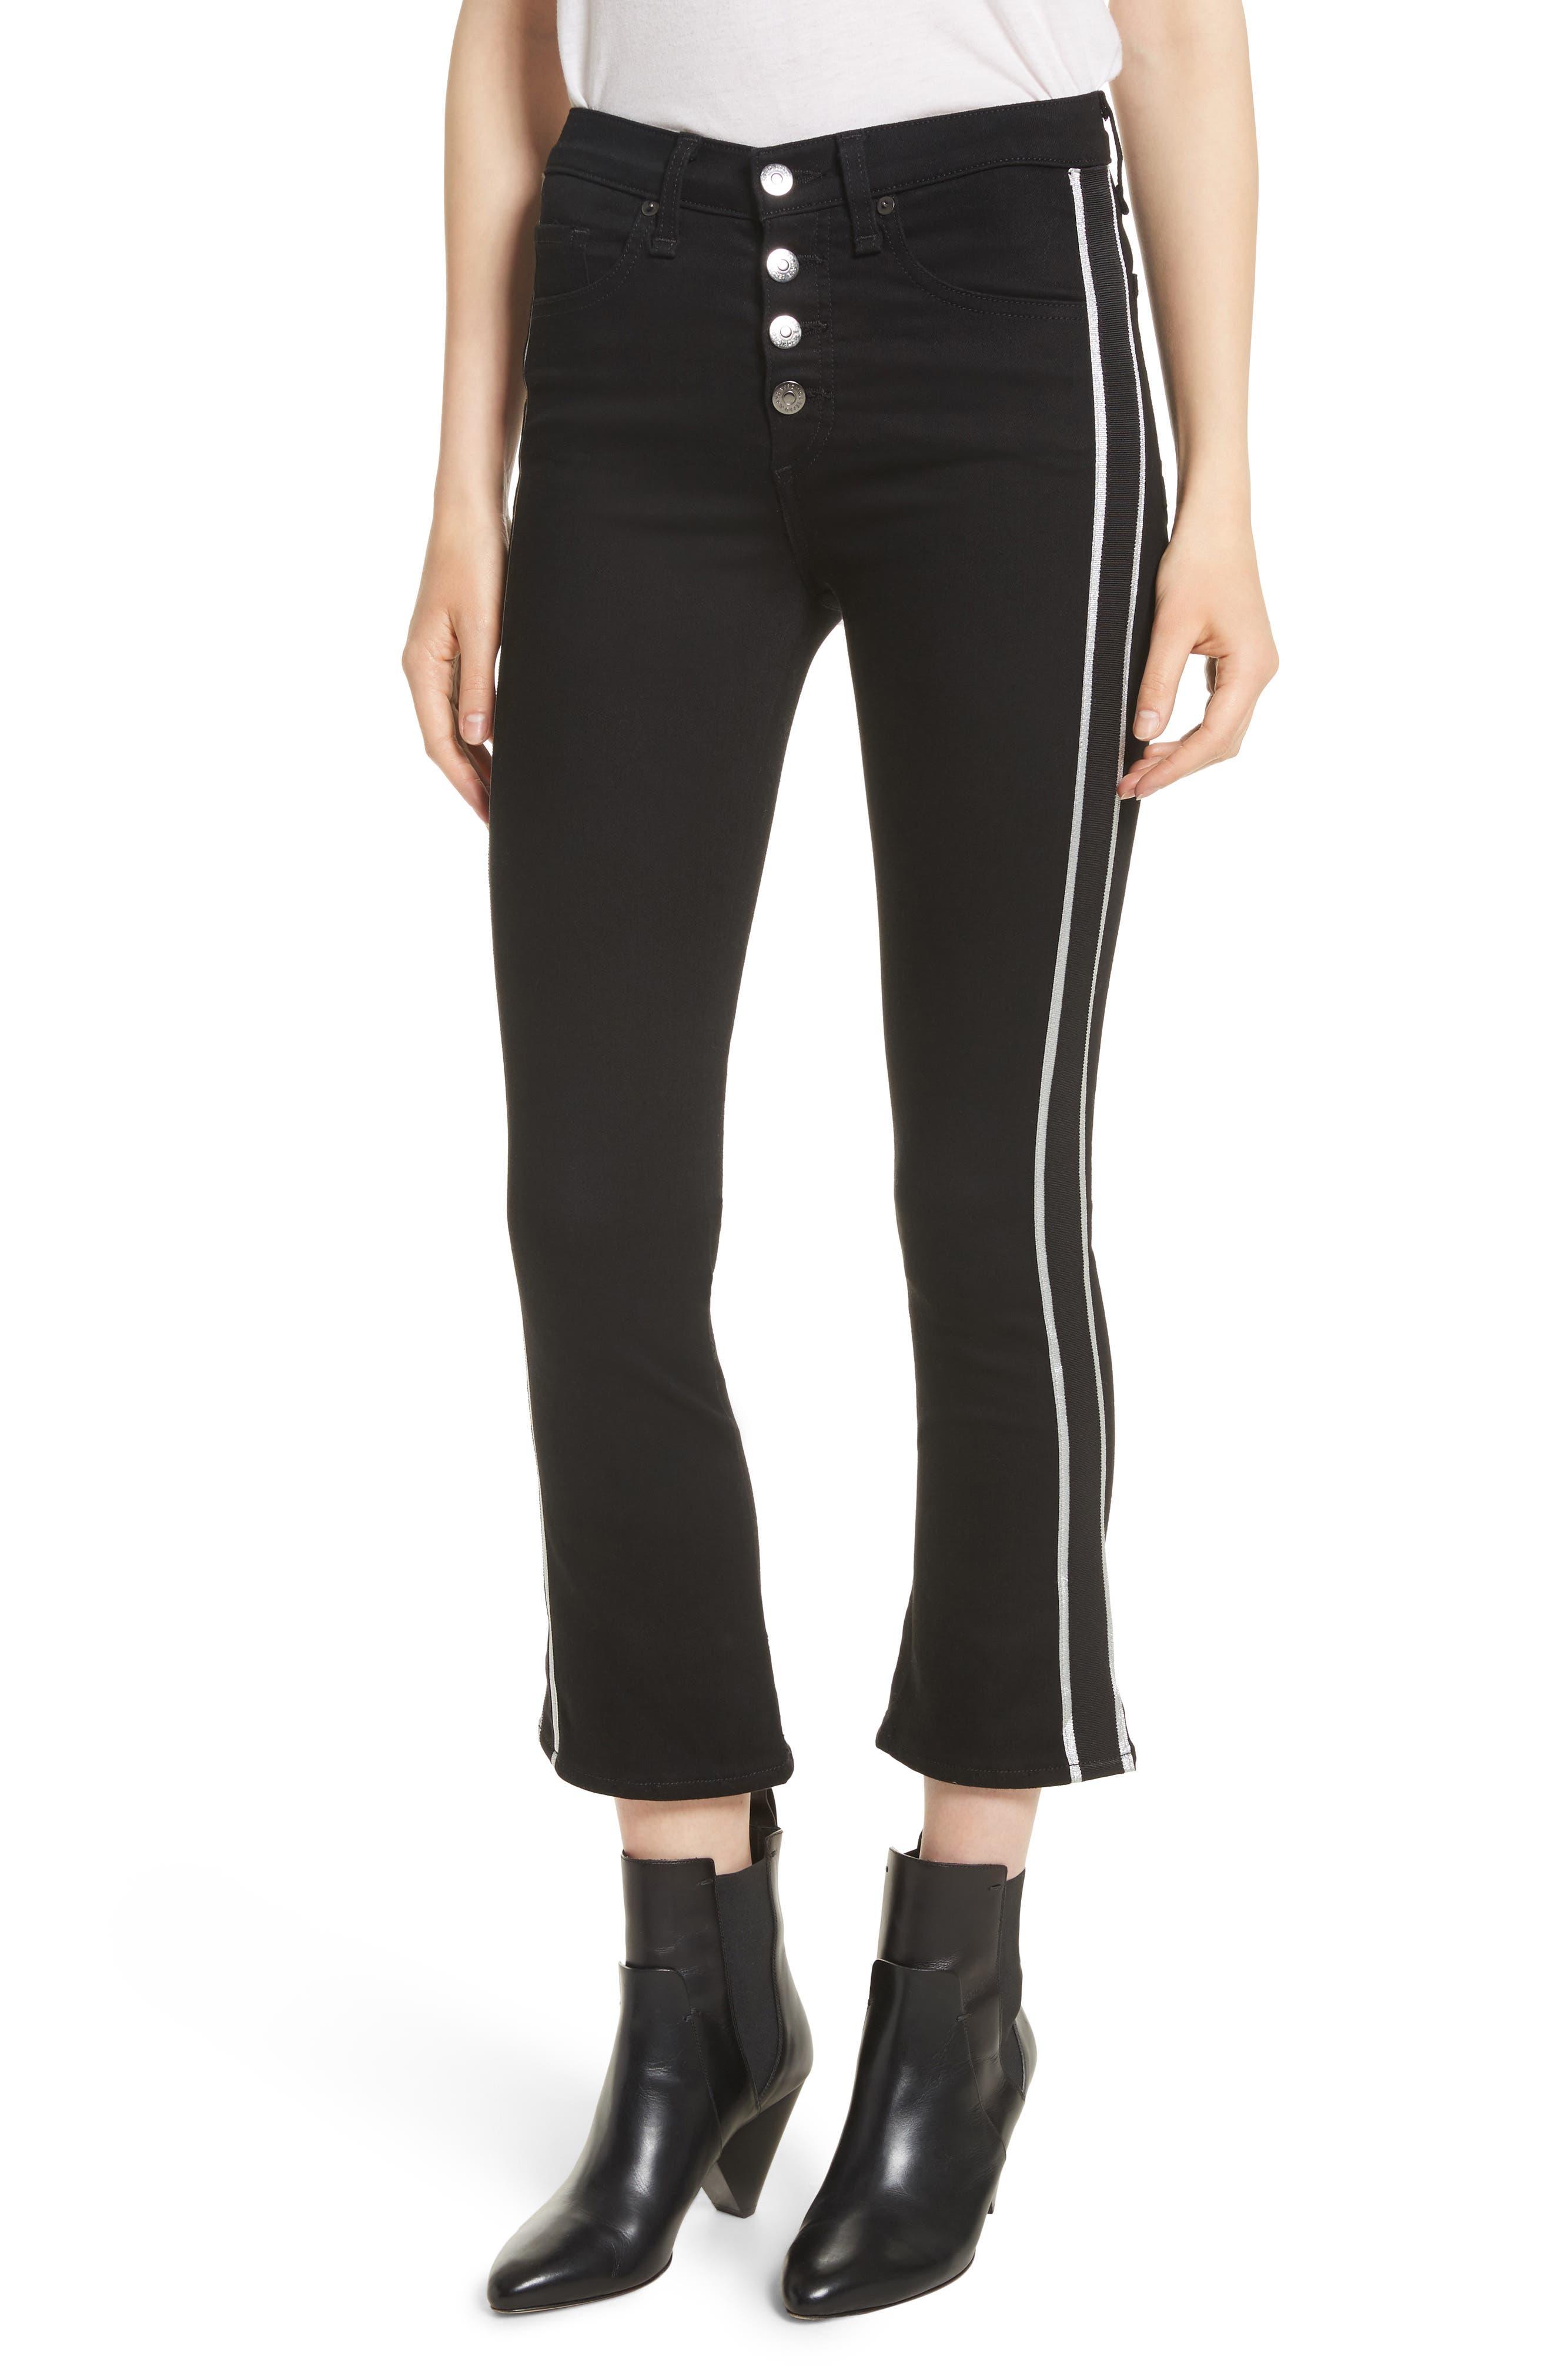 Main Image - Veronica Beard Carolyn Tux Stripe Baby Boot Jeans